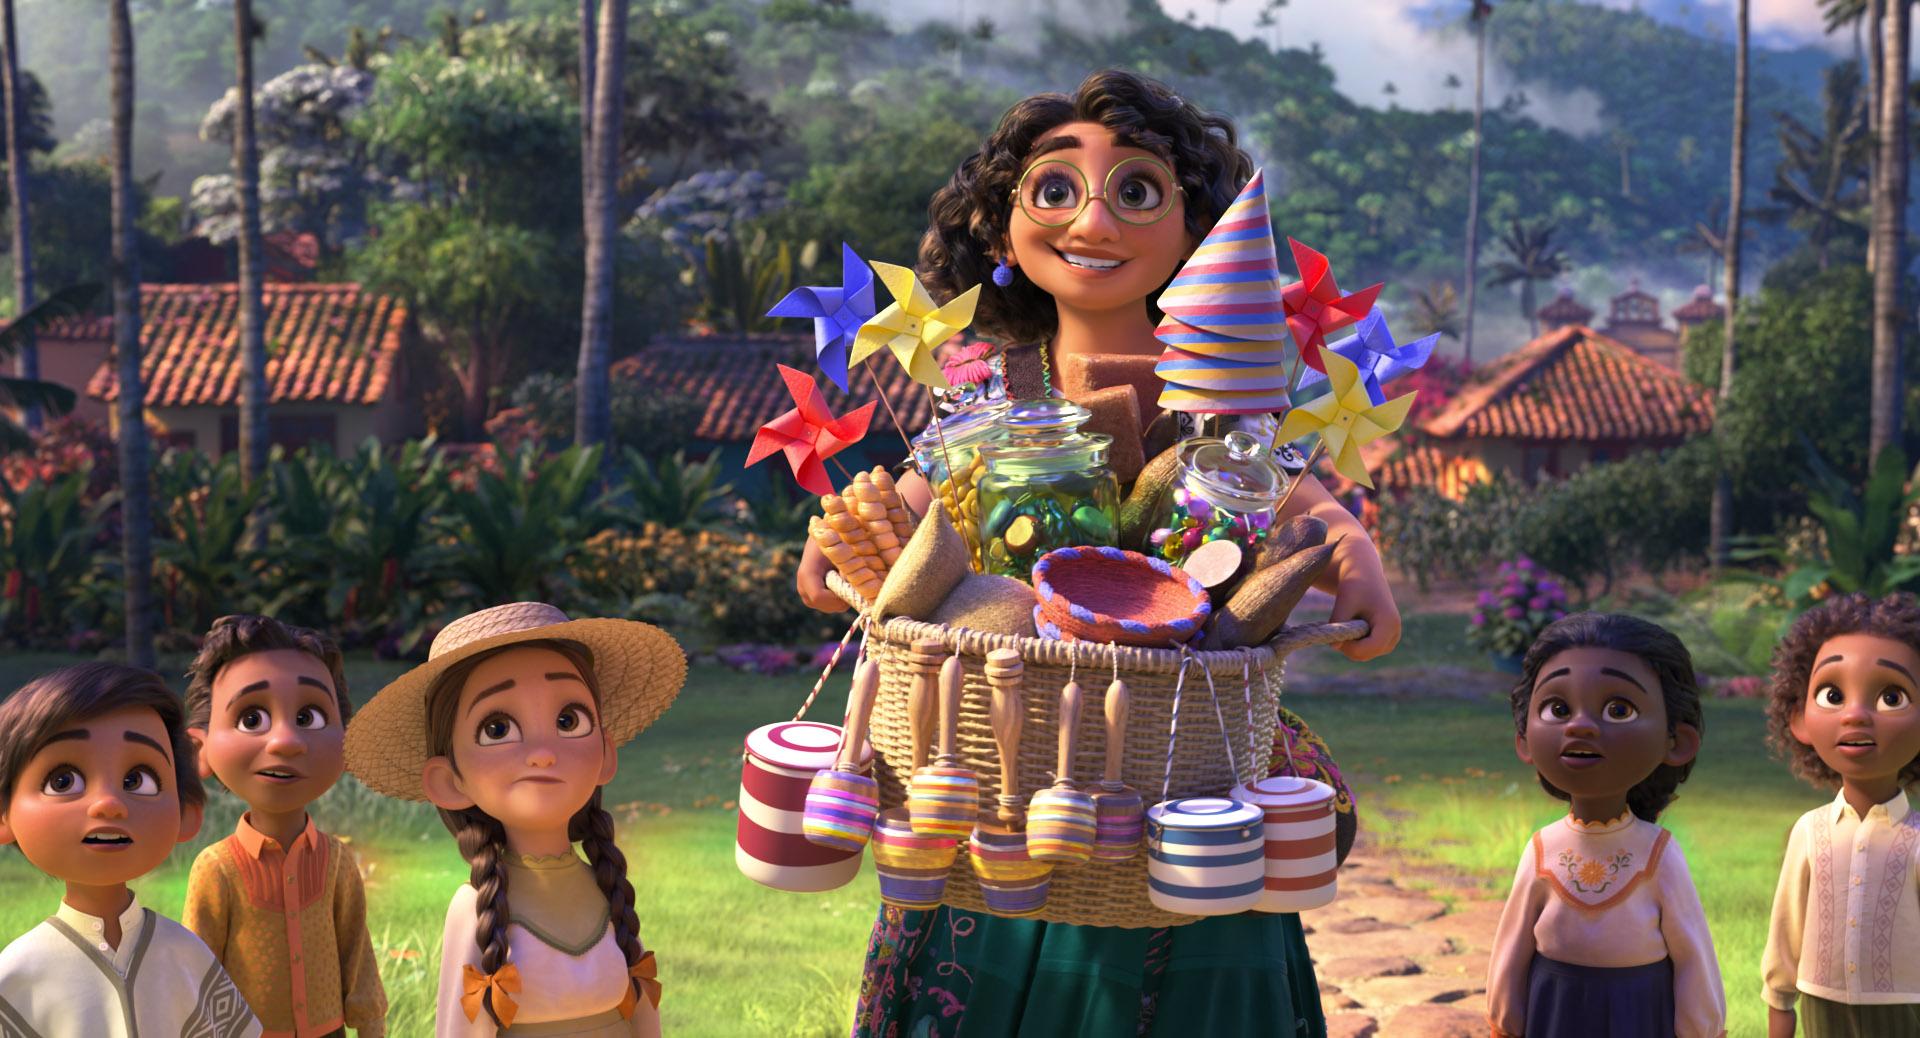 Encanto - La Fantastique Famille Madrigal [Walt Disney - 2021] - Page 3 E5w_fQ_XMAMietp?format=jpg&name=large